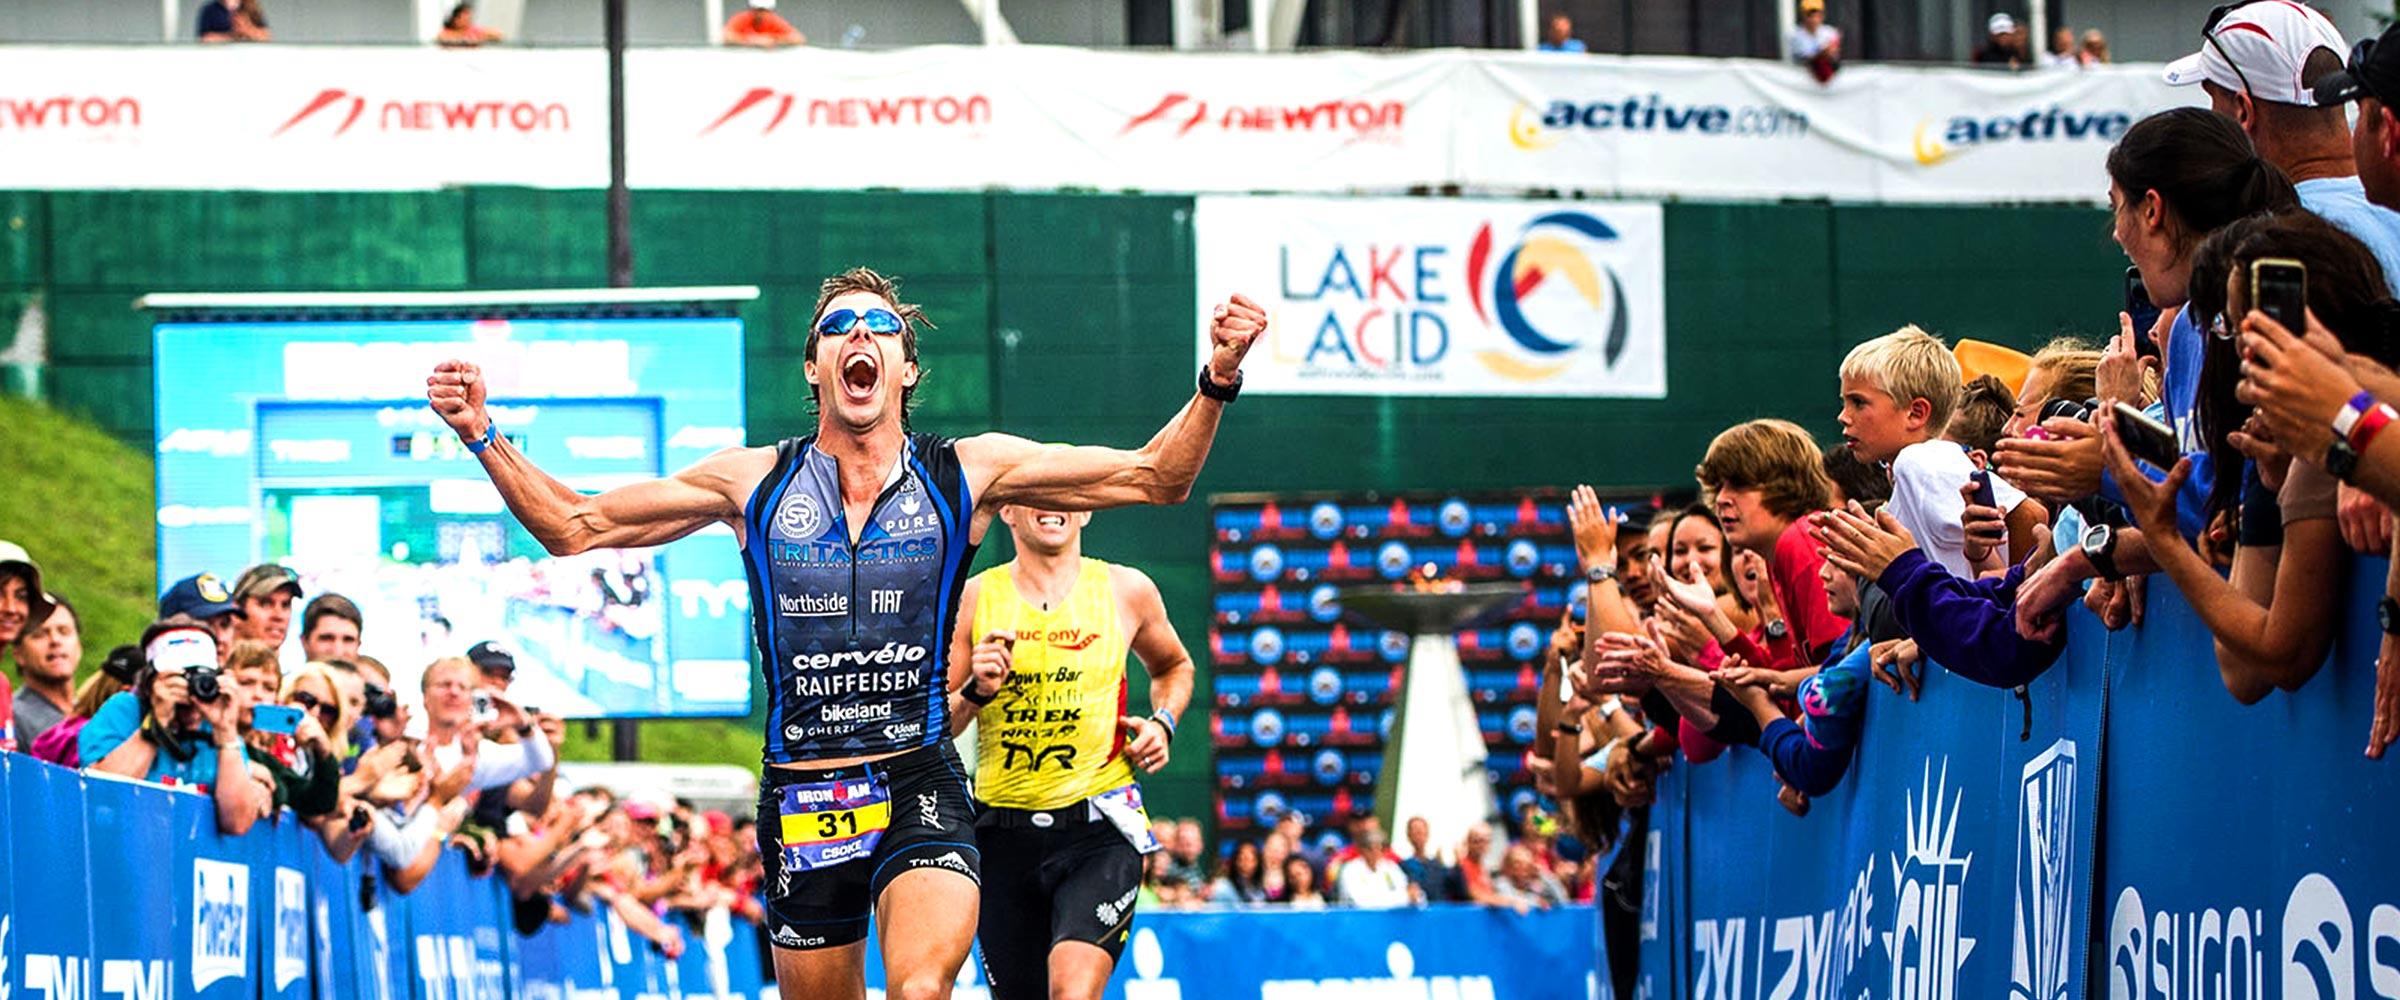 Ironman Lake Placid   Raceatlas Within Lake Placid Events 2021